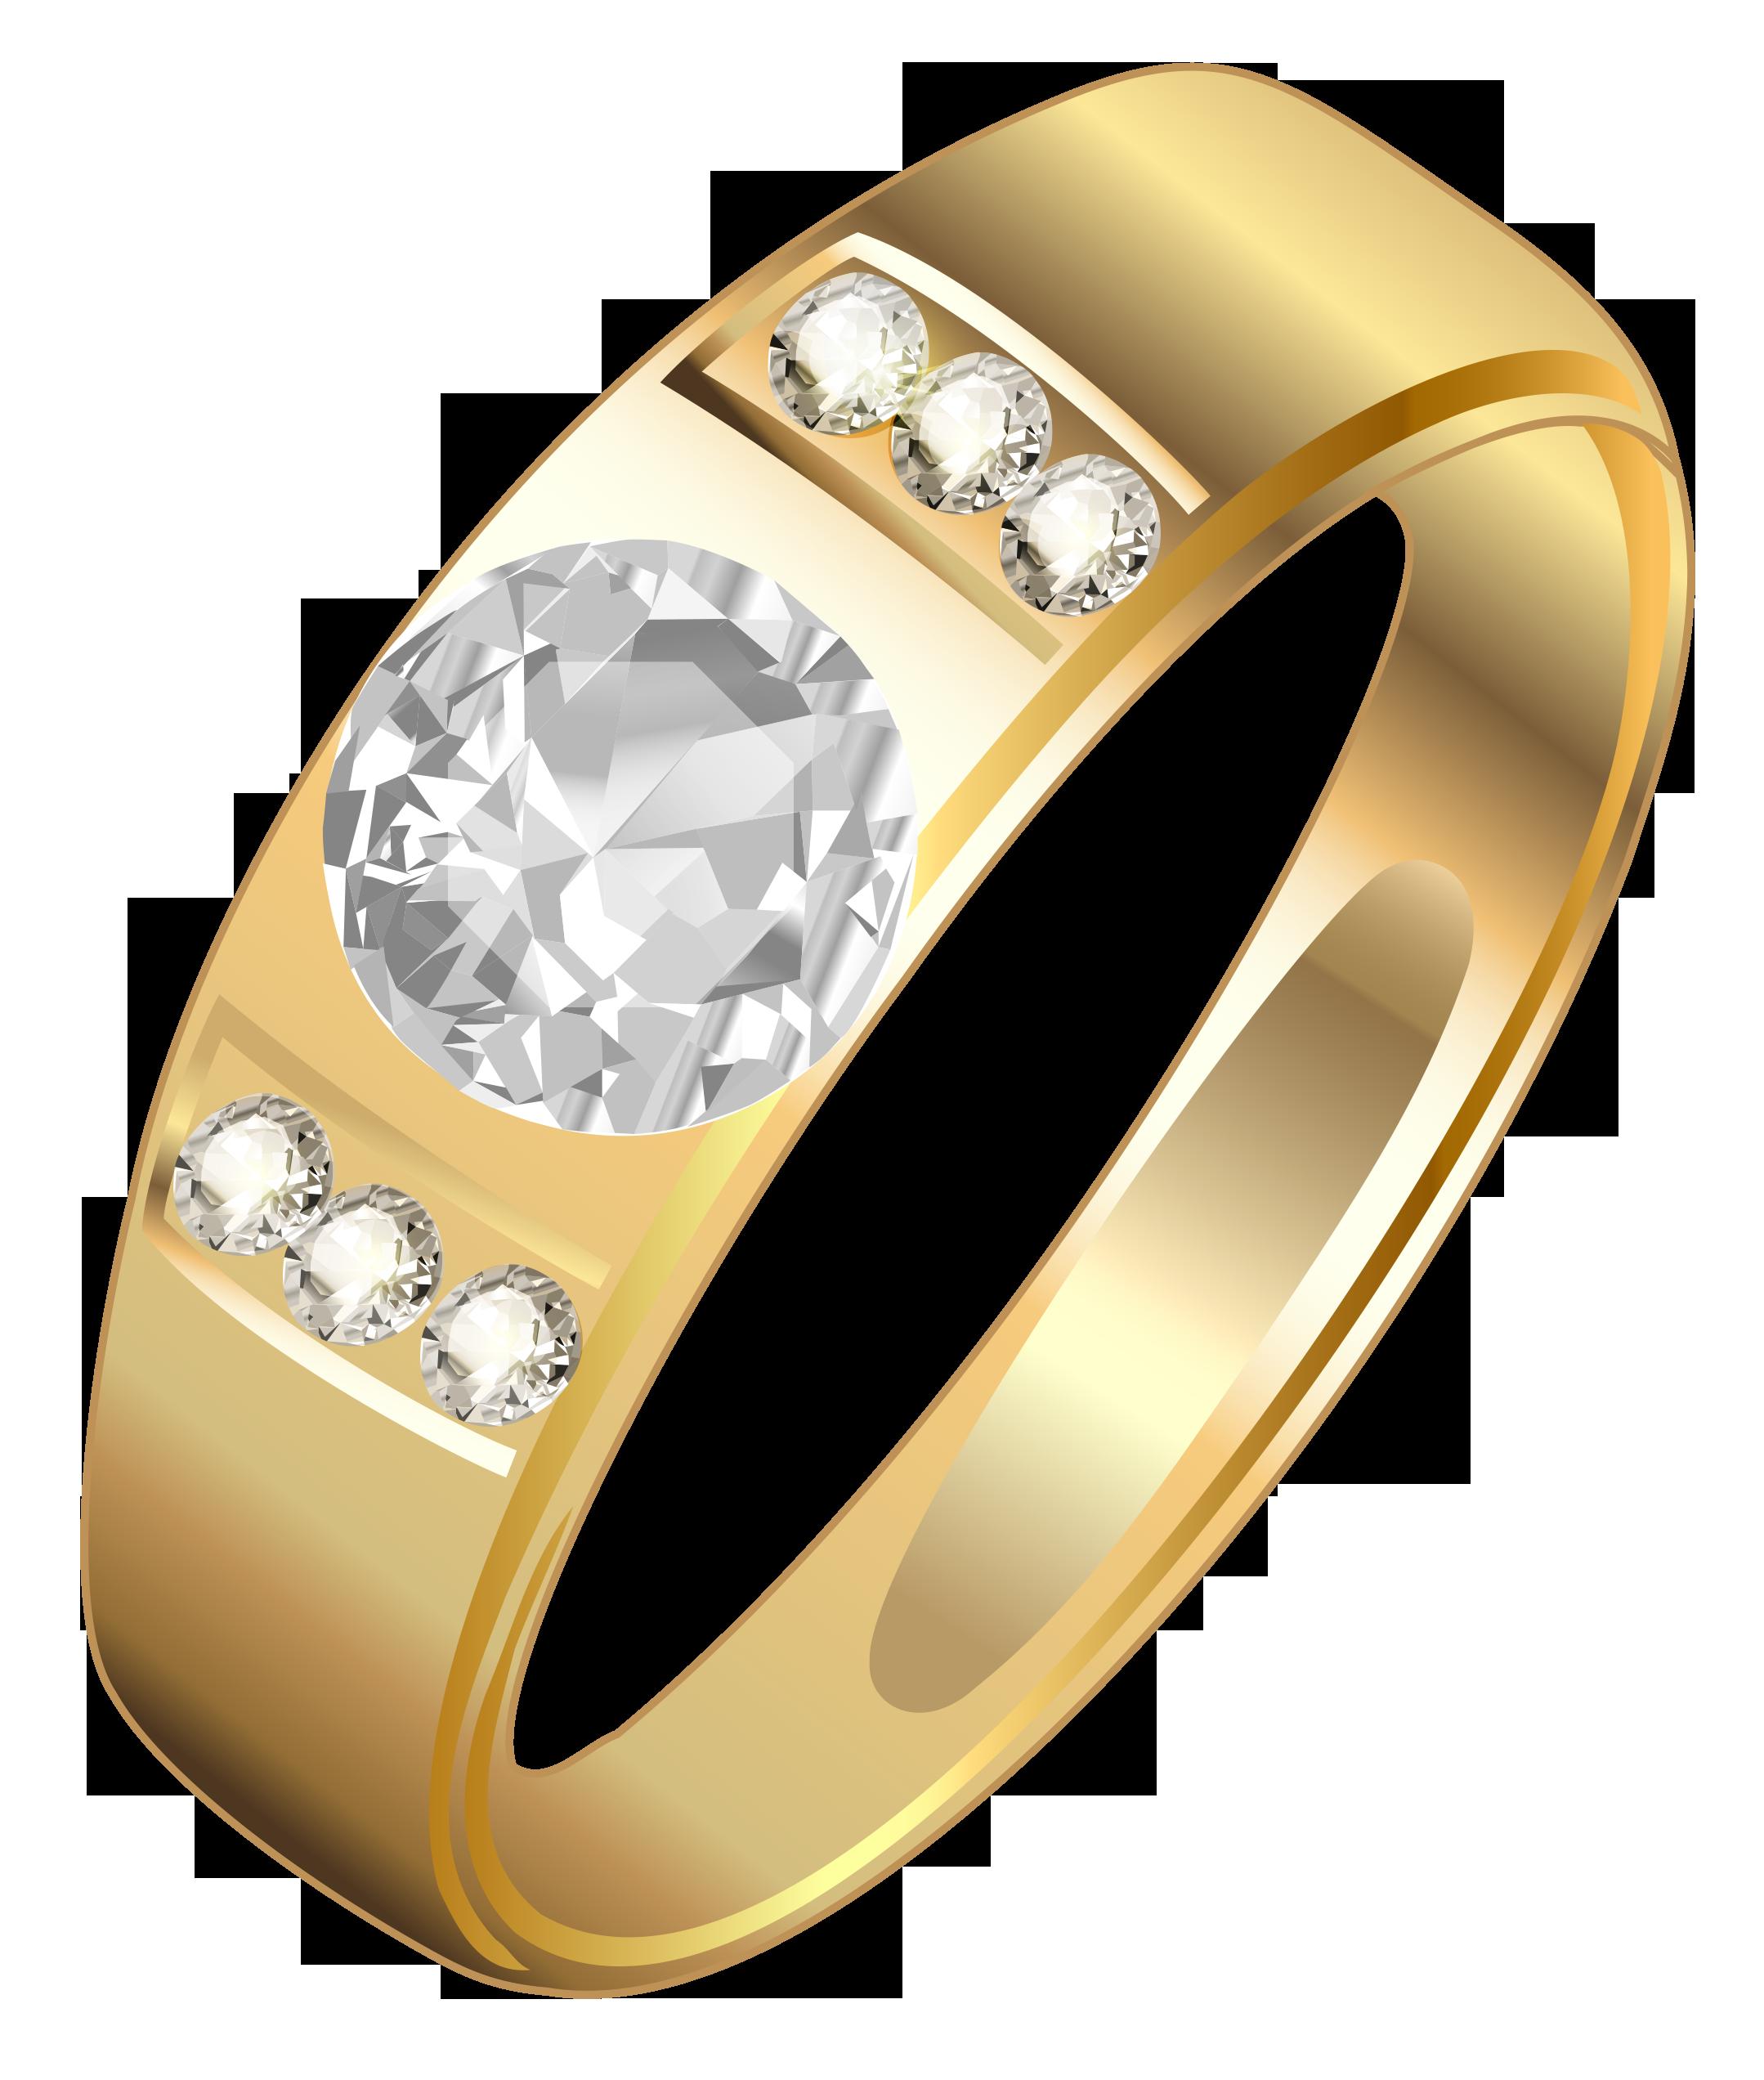 Golden ring png gallery. Diamonds clipart platinum